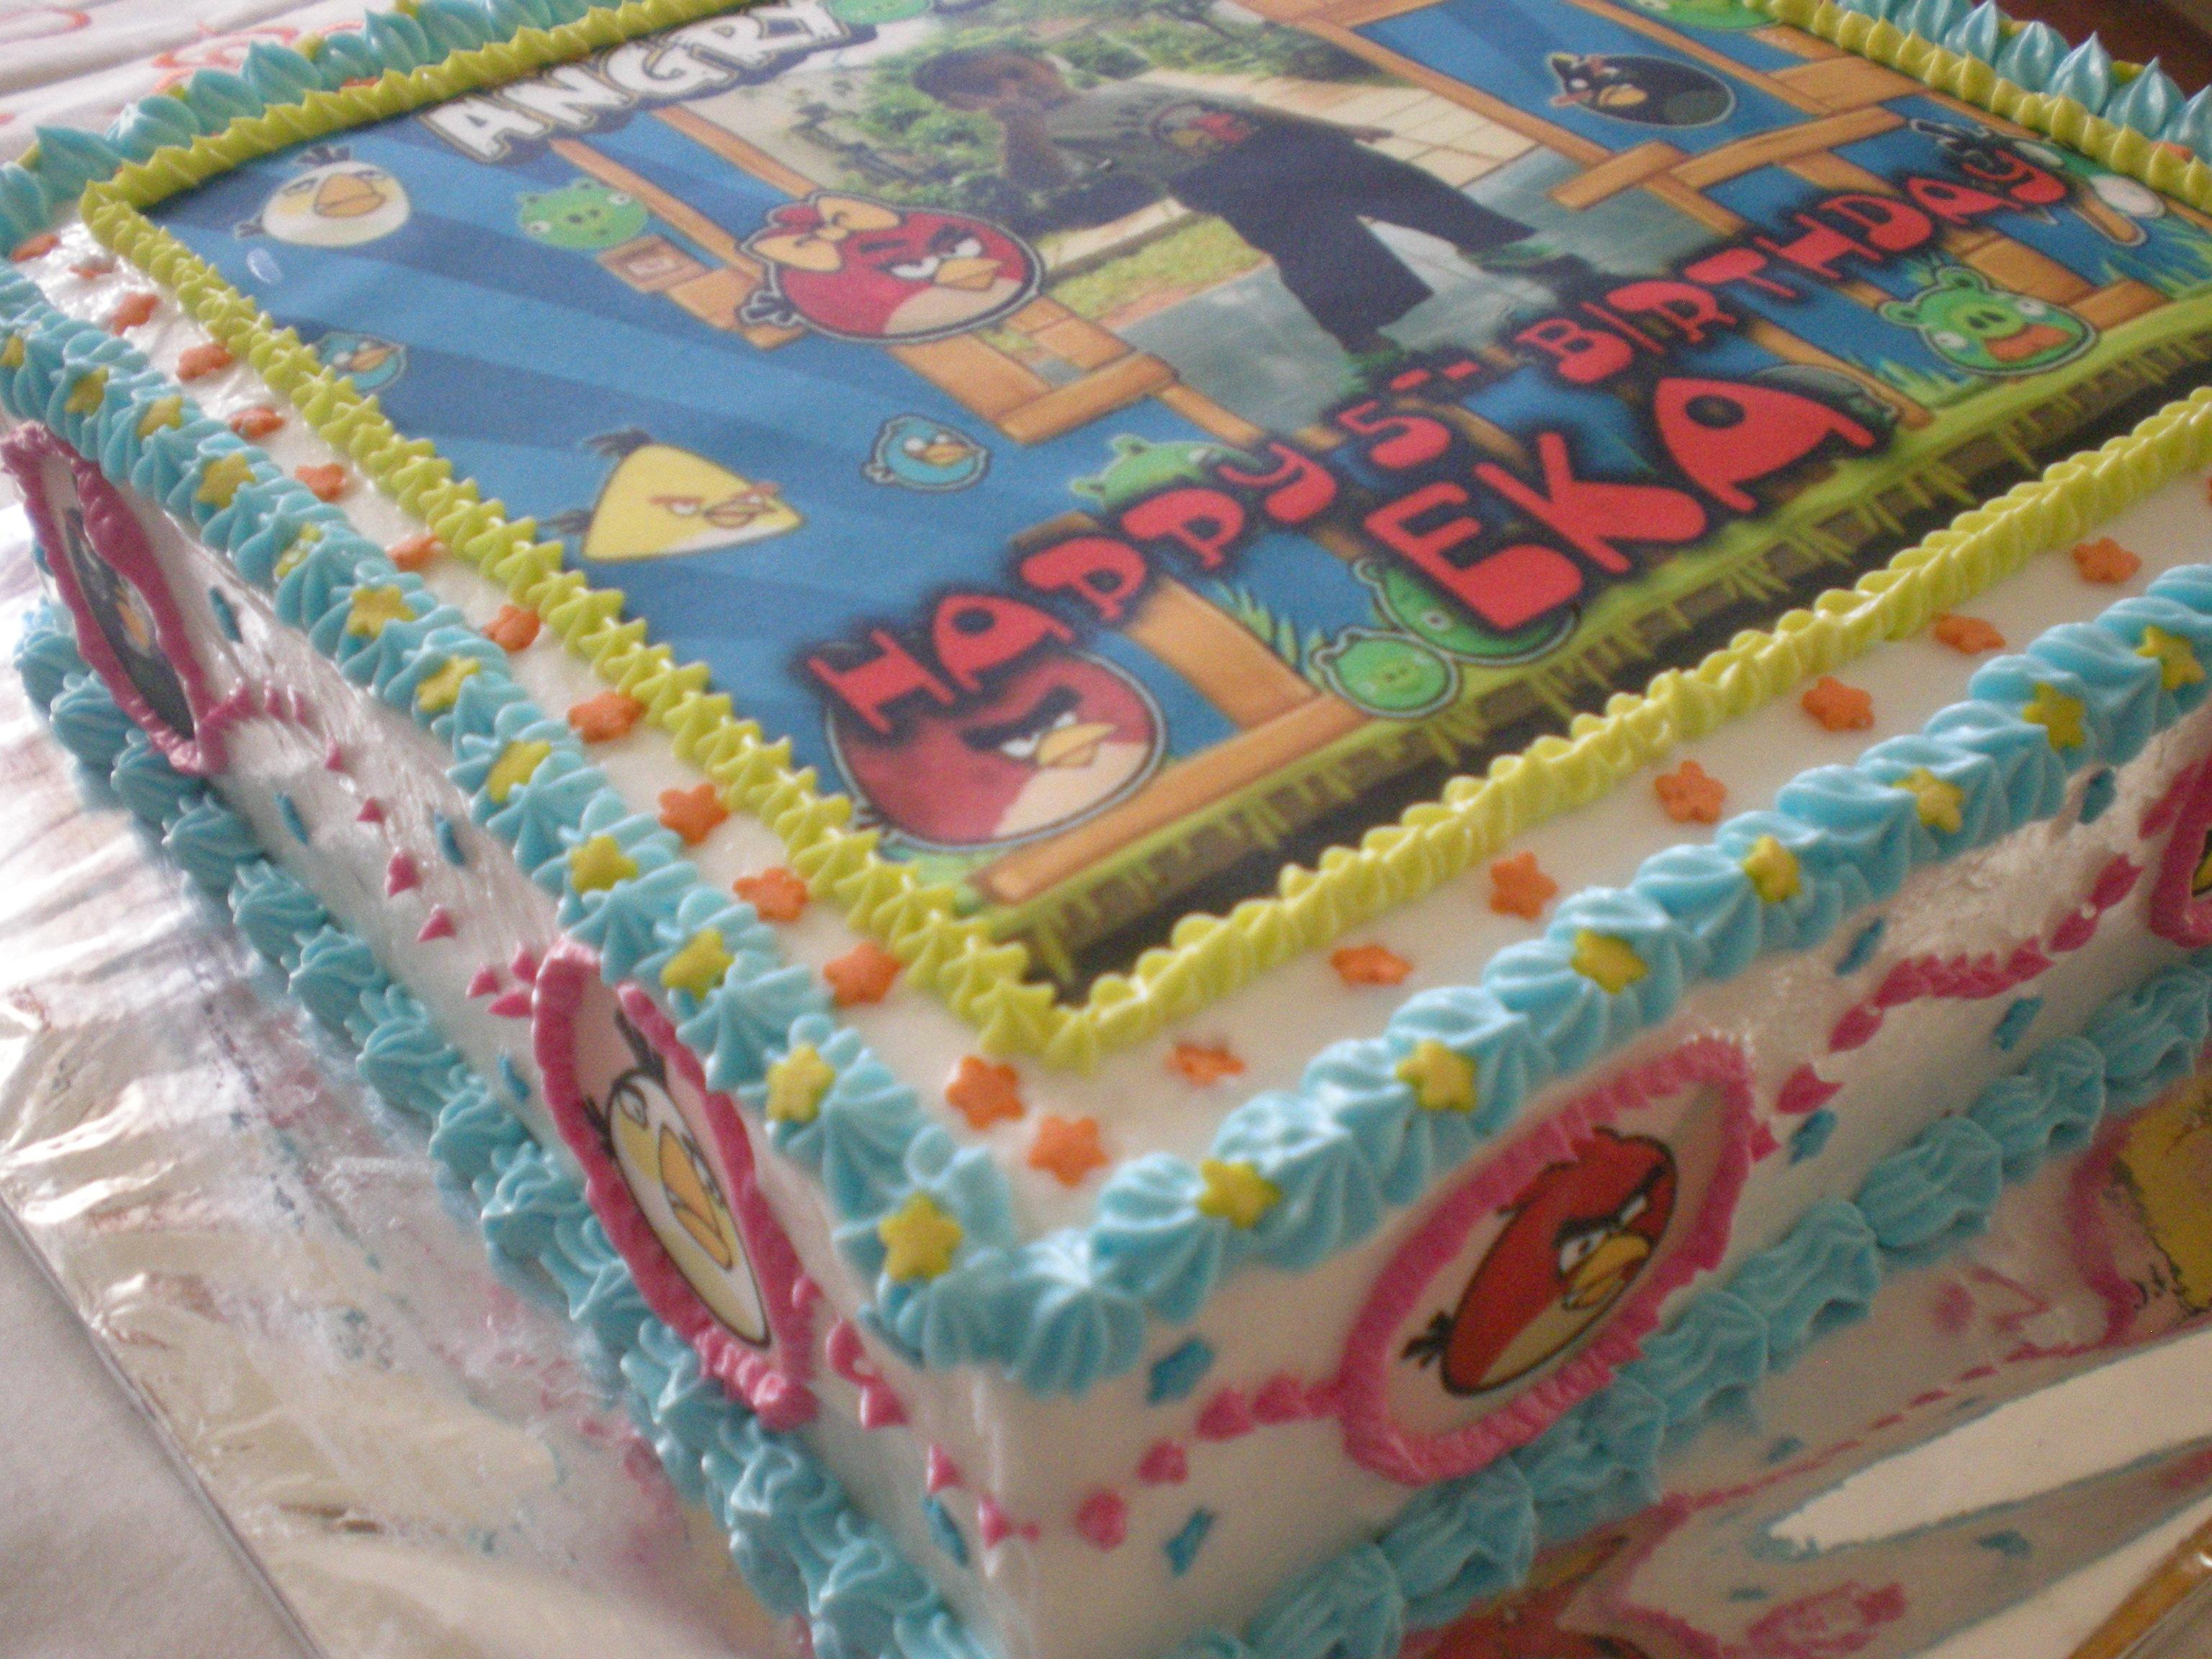 Kue Ulang Tahun dengan foto – Product by Dapur Cetta